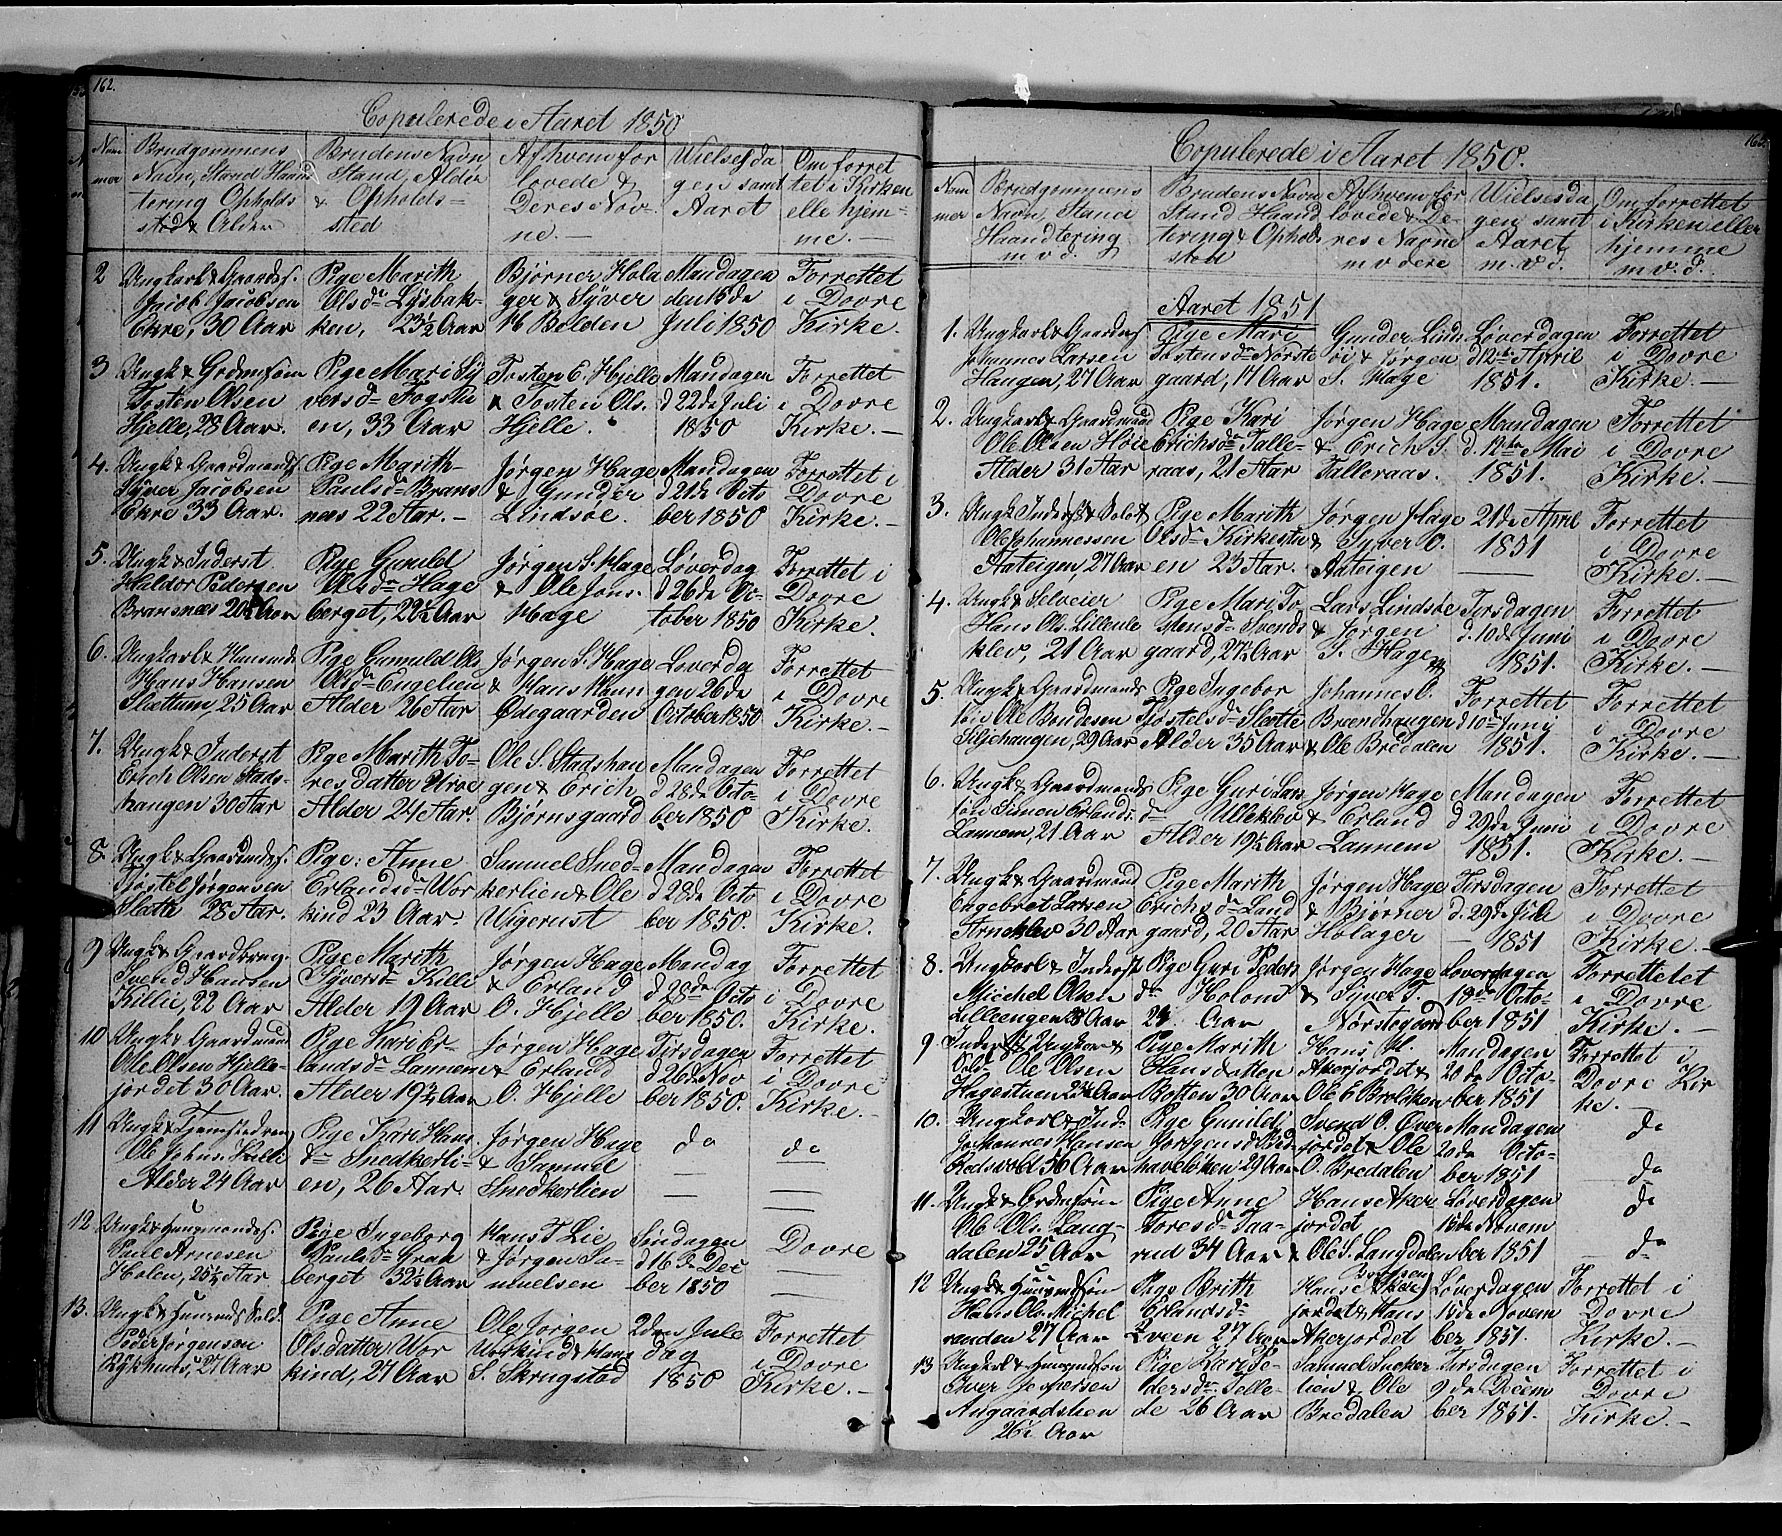 SAH, Lesja prestekontor, Klokkerbok nr. 3, 1842-1862, s. 162-163